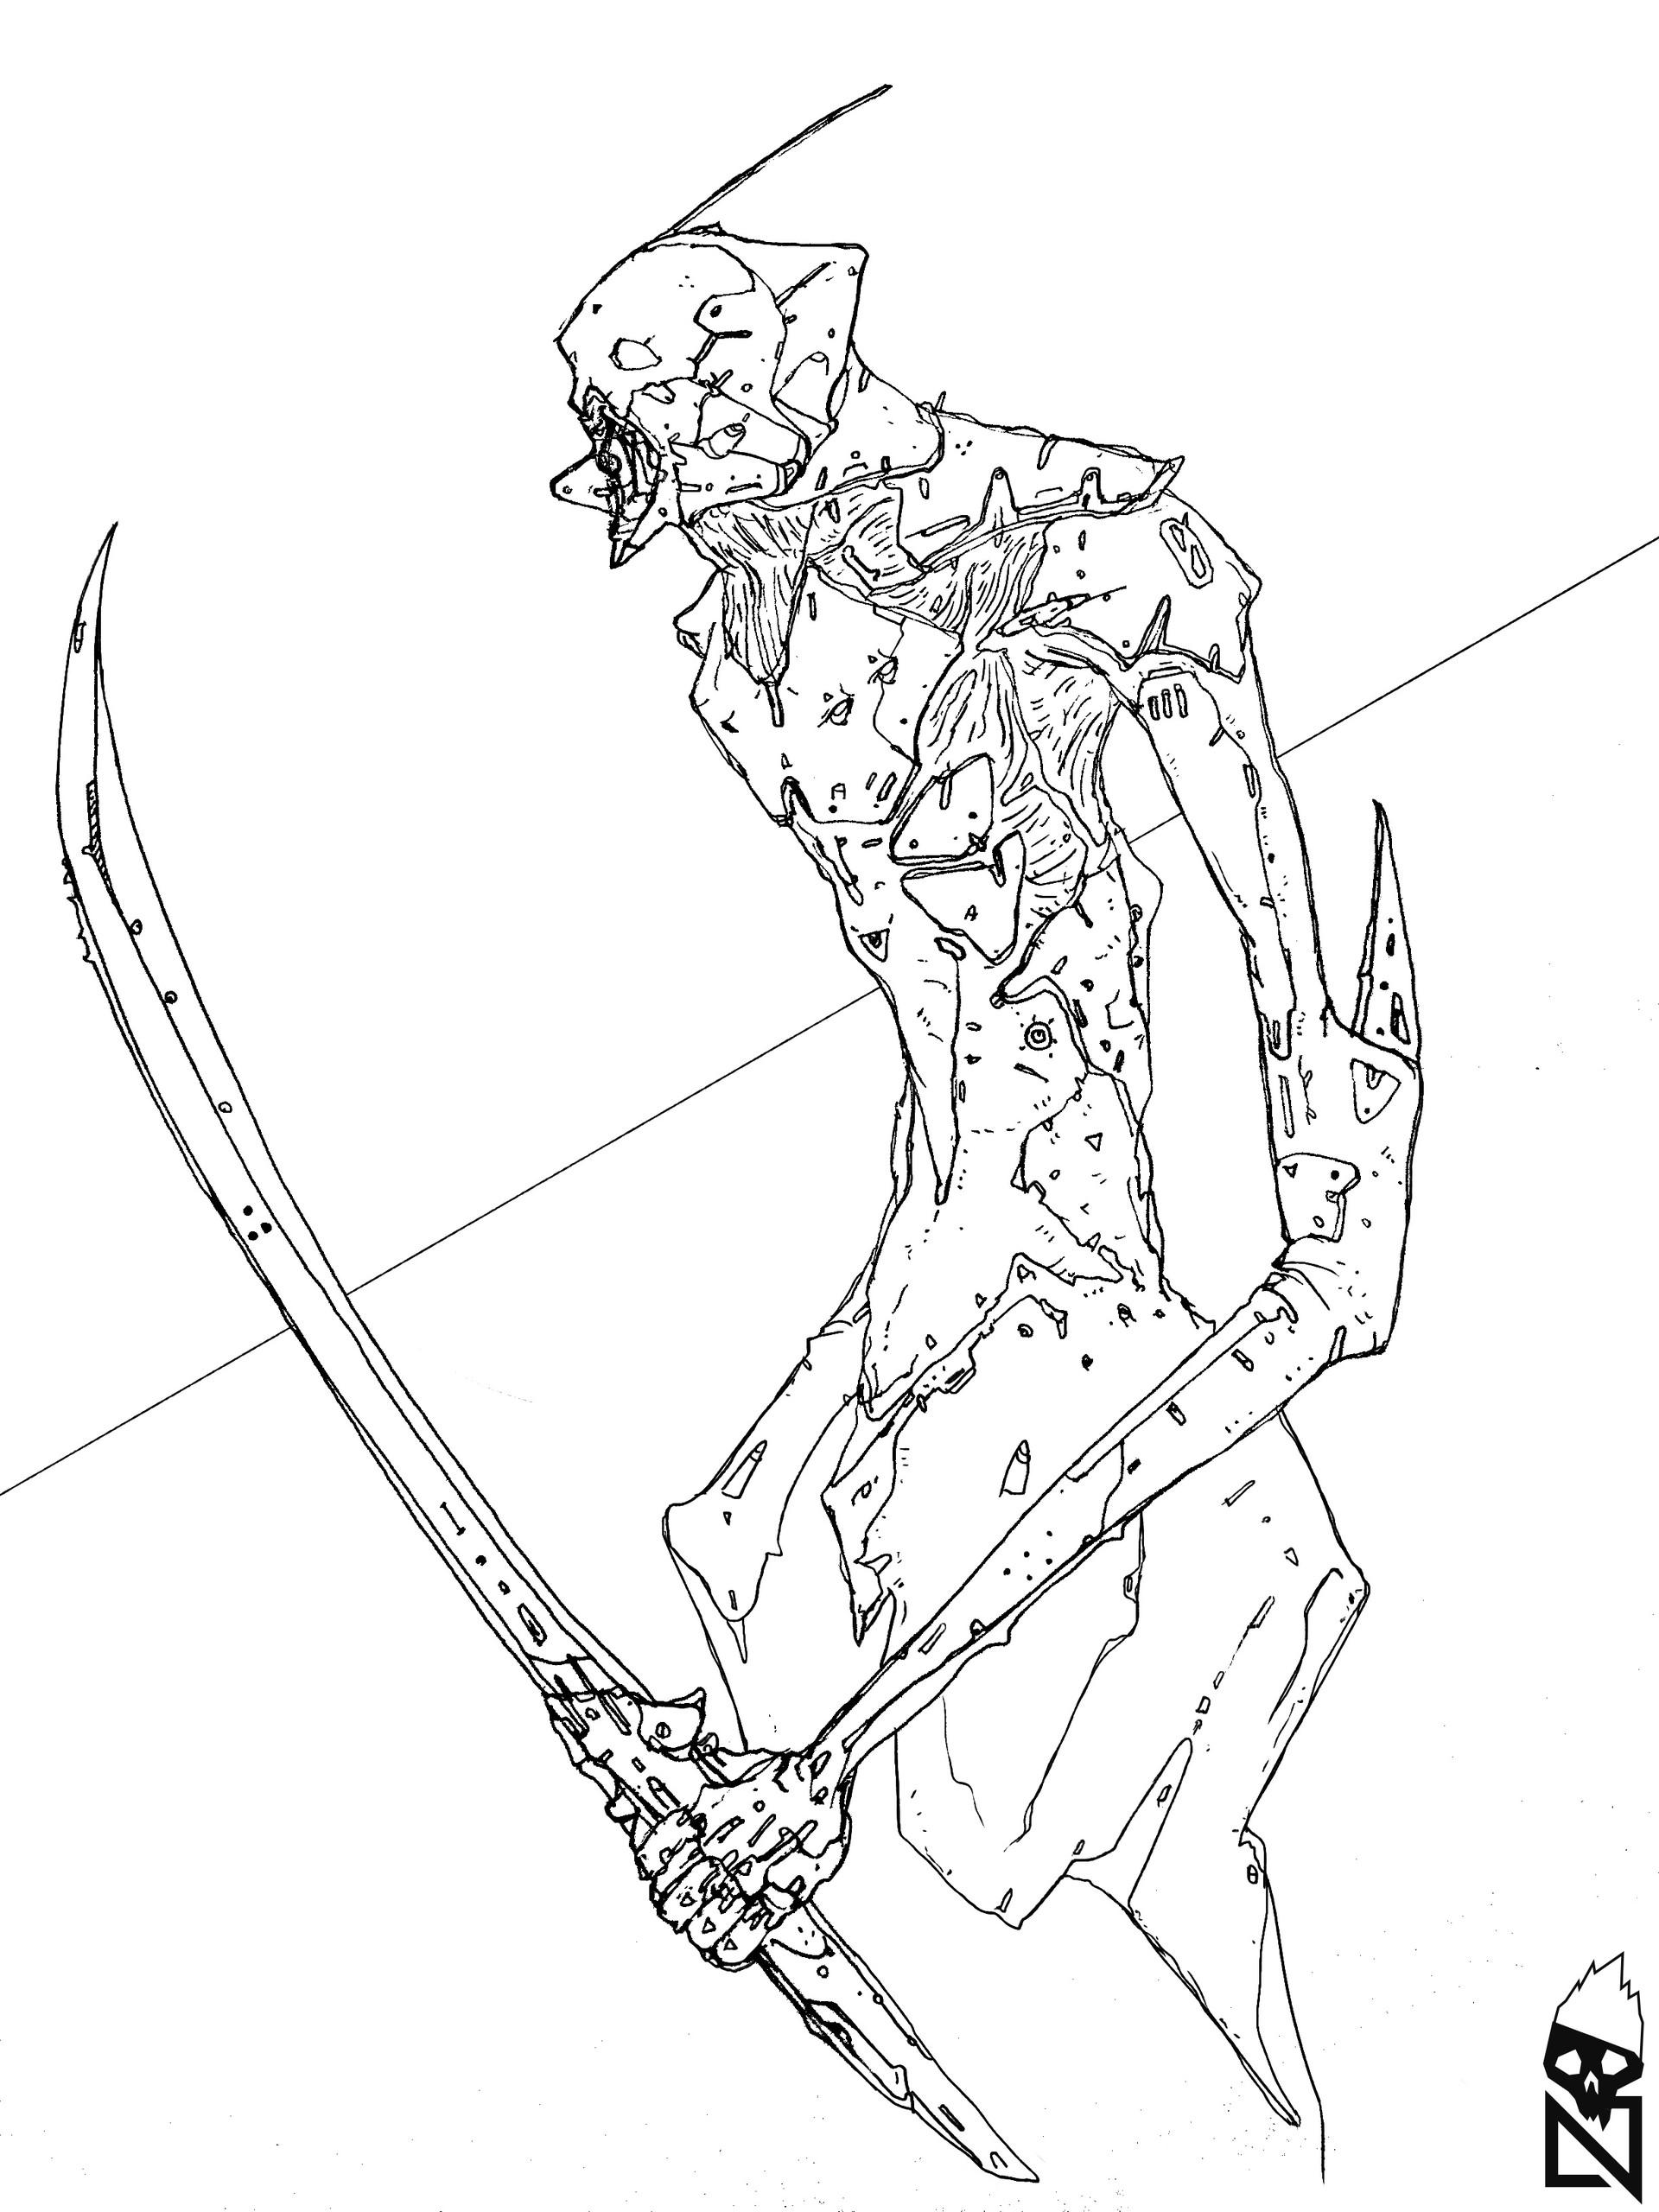 Original ink sketch